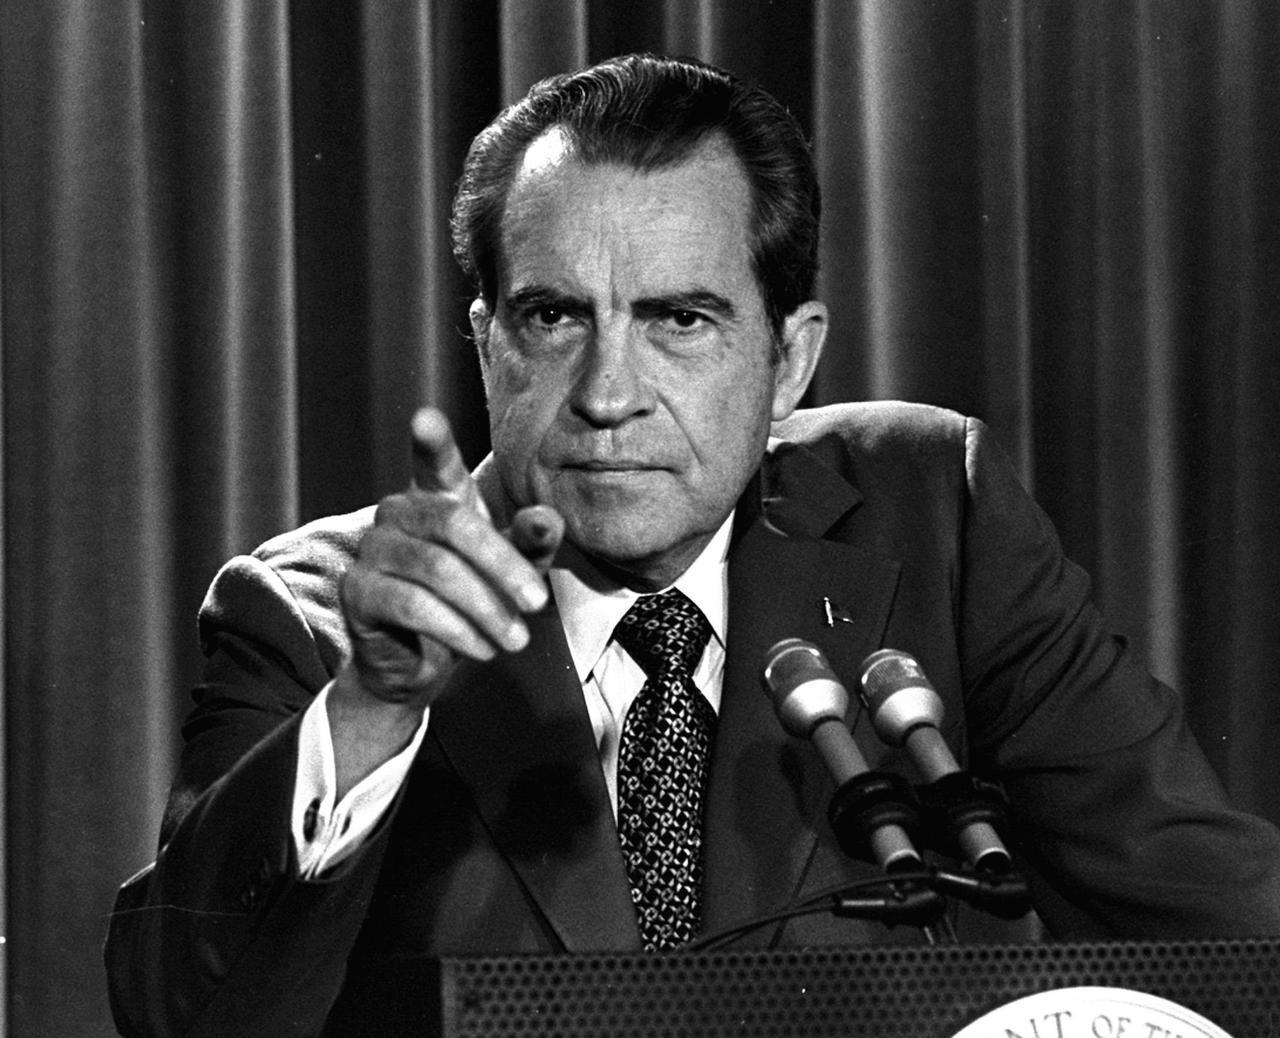 Tricky Dicky Nixon